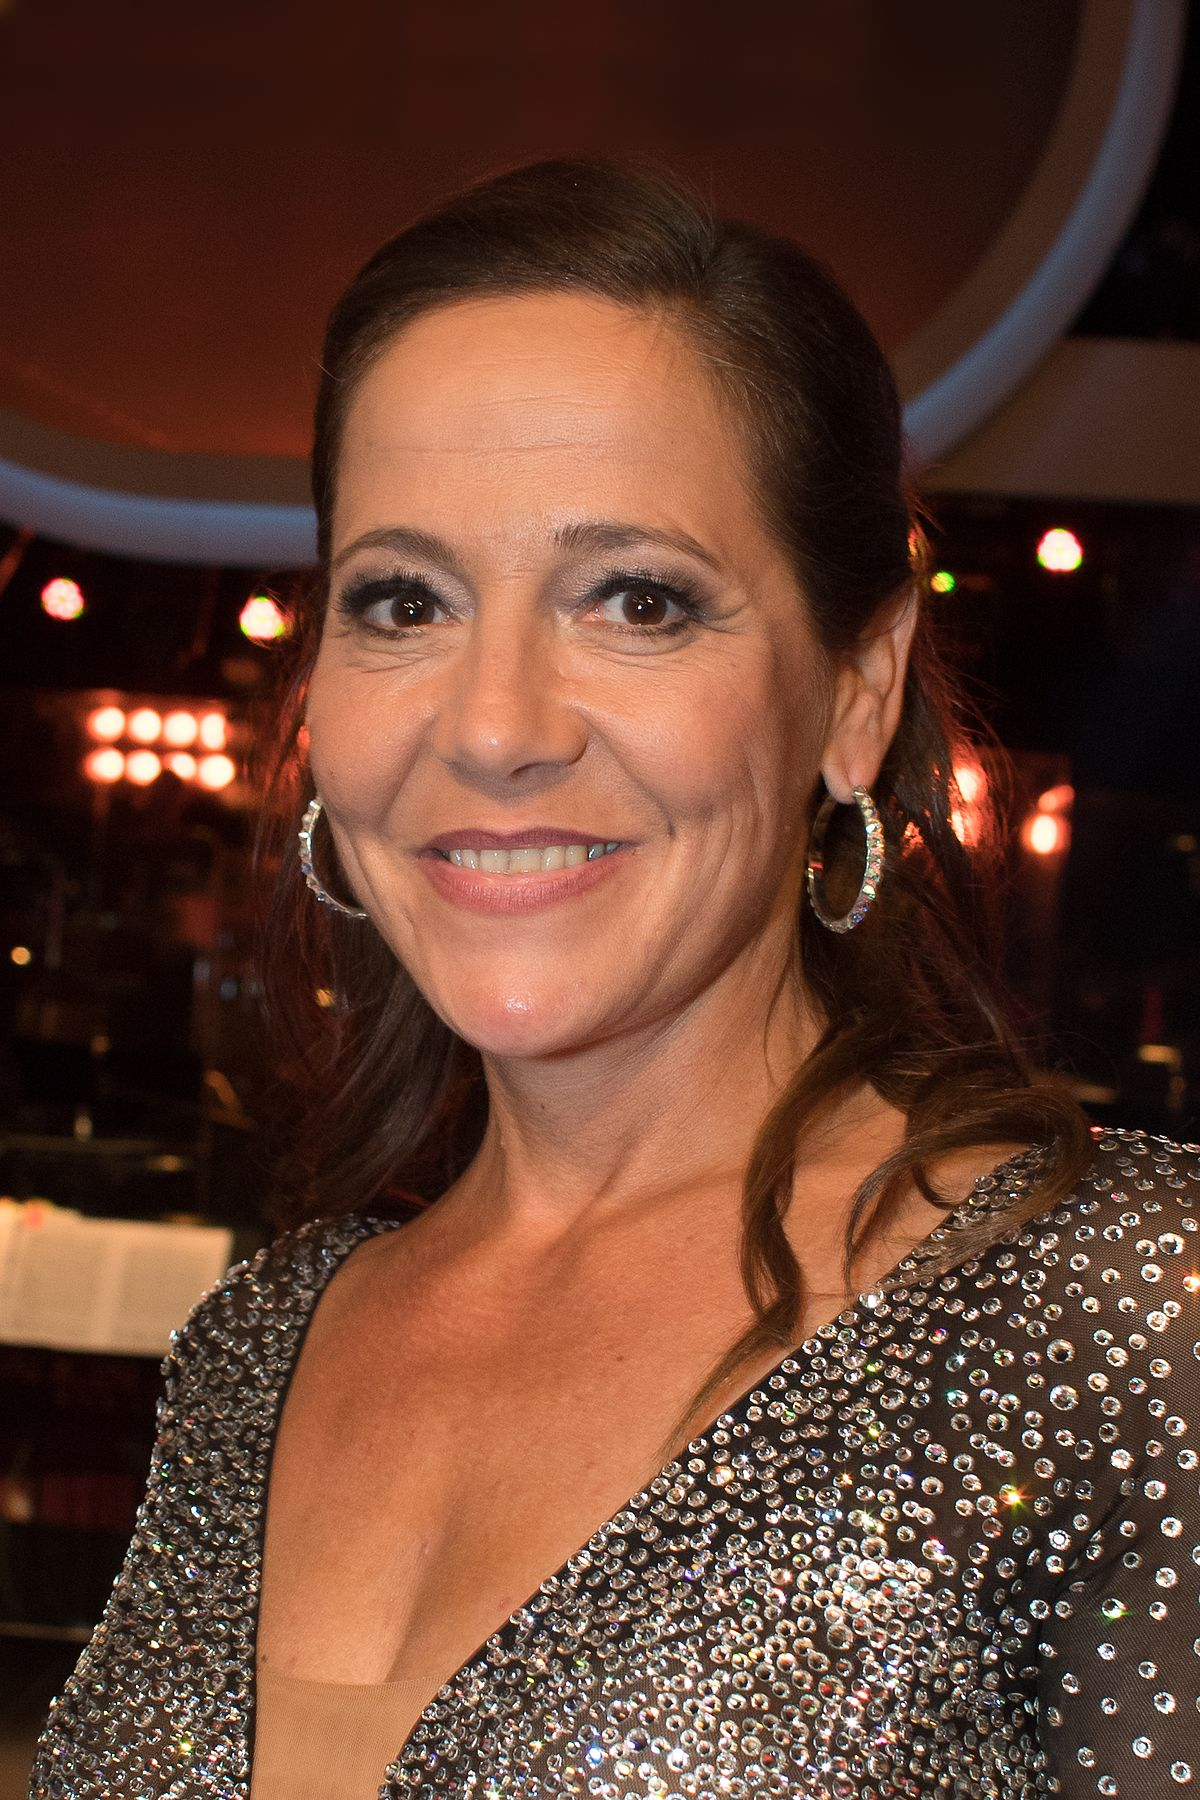 Monica Weinzettl